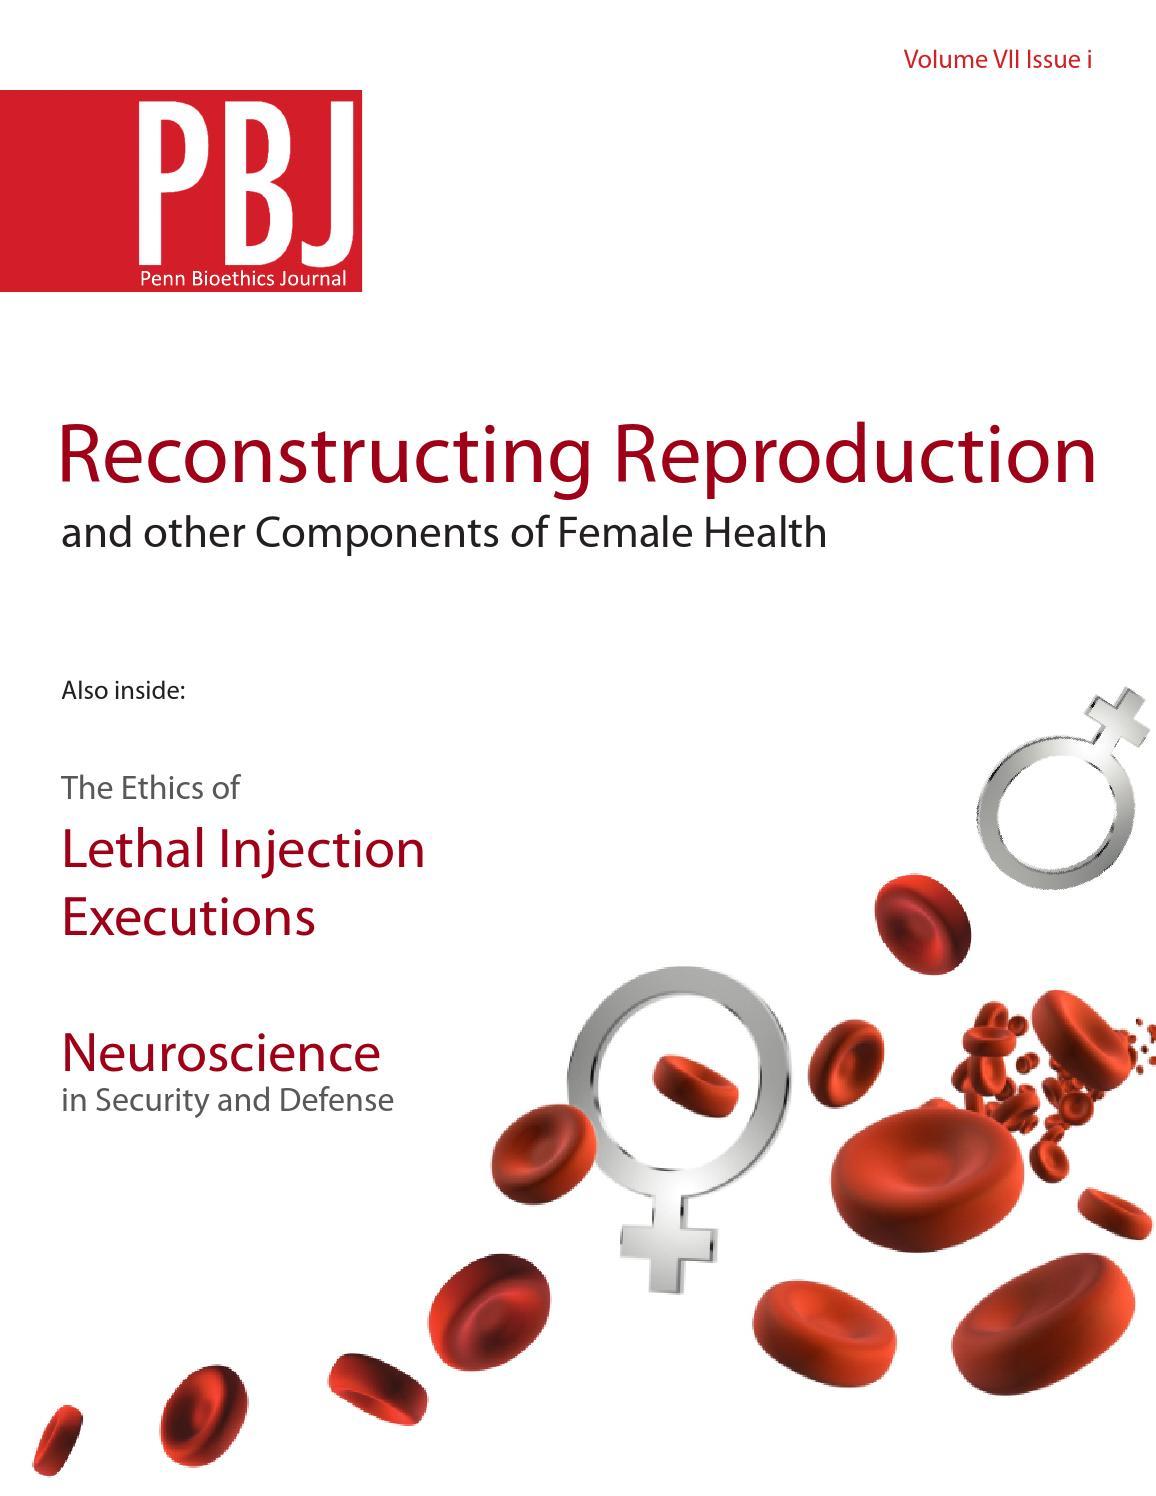 Volume Vii Issue I By Penn Bioethics Journal Issuu